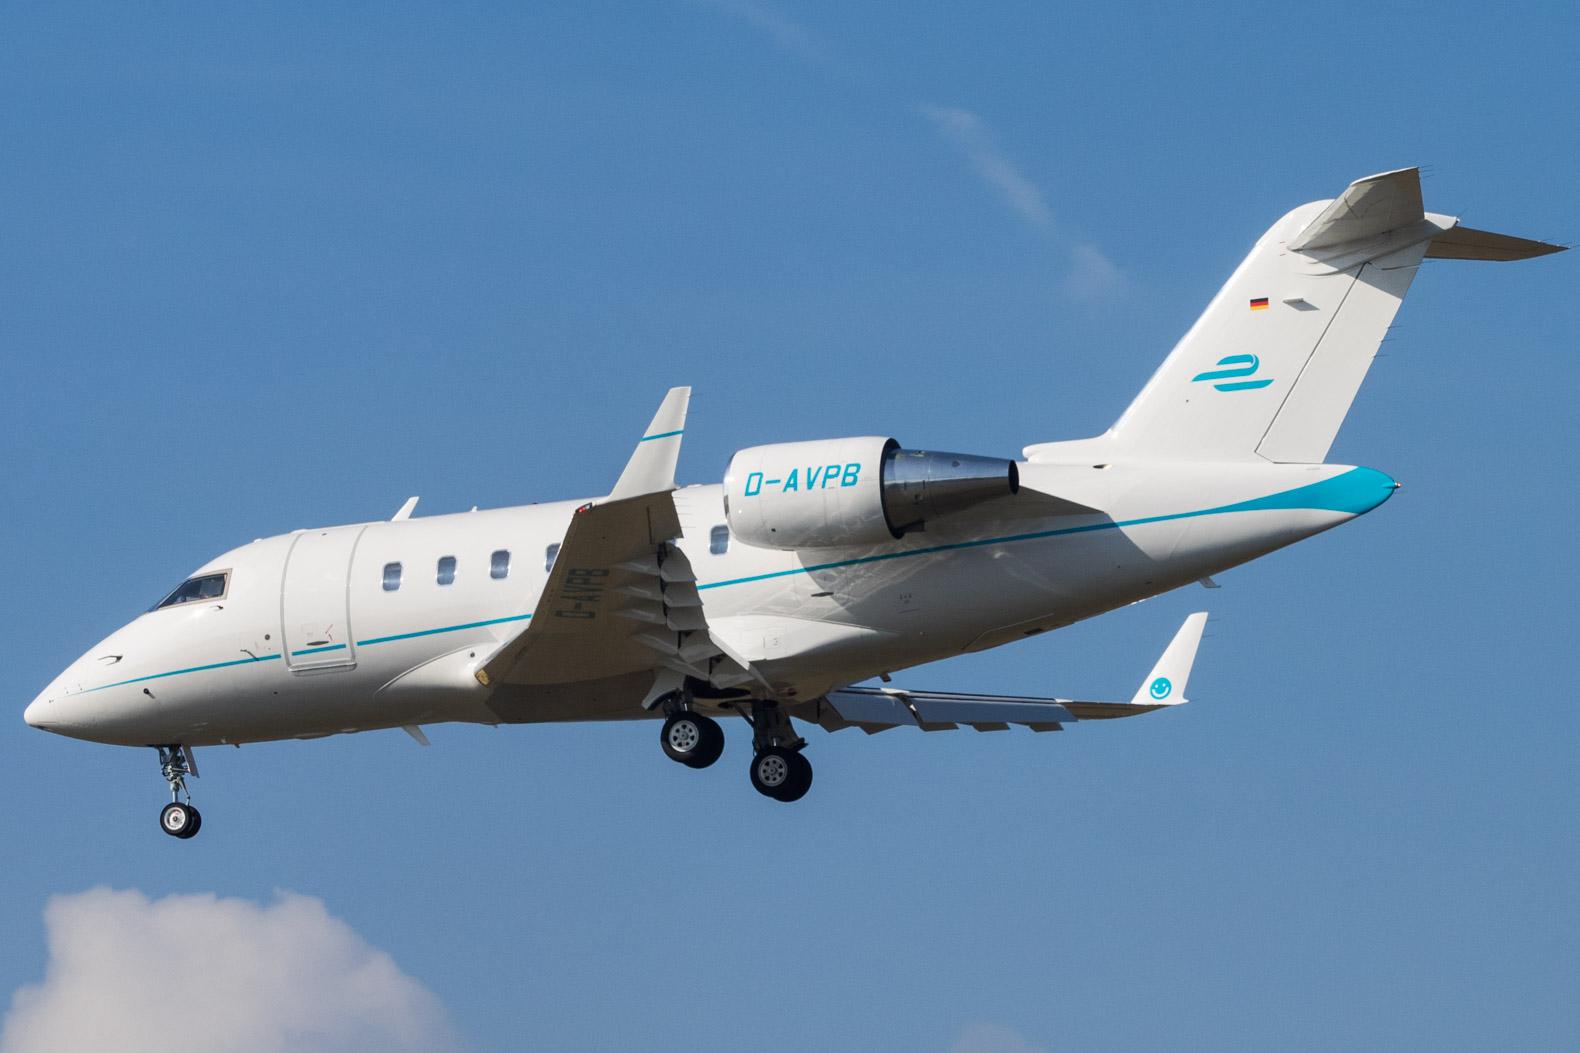 File:D-AVPB Bombardier CL-600-2B16 Challenger 605 CL60 - MHV